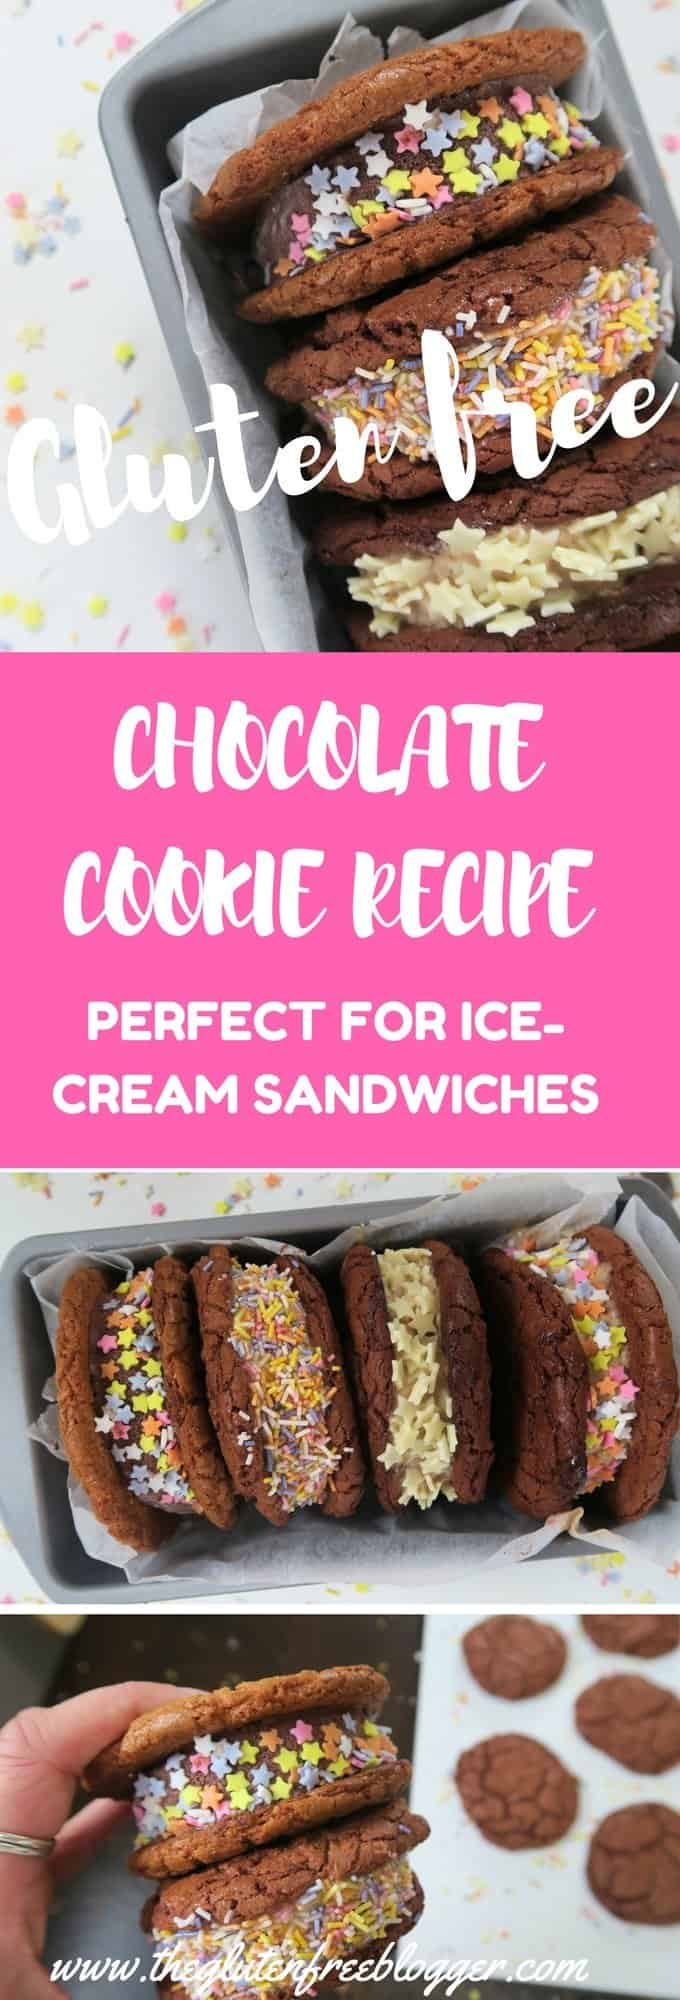 GLUTEN FREE CHOCOLATE COOKIE RECIPE INTO COOKIE ICE-CREAM SANDWICHES- www.theglutenfreeblogger.com